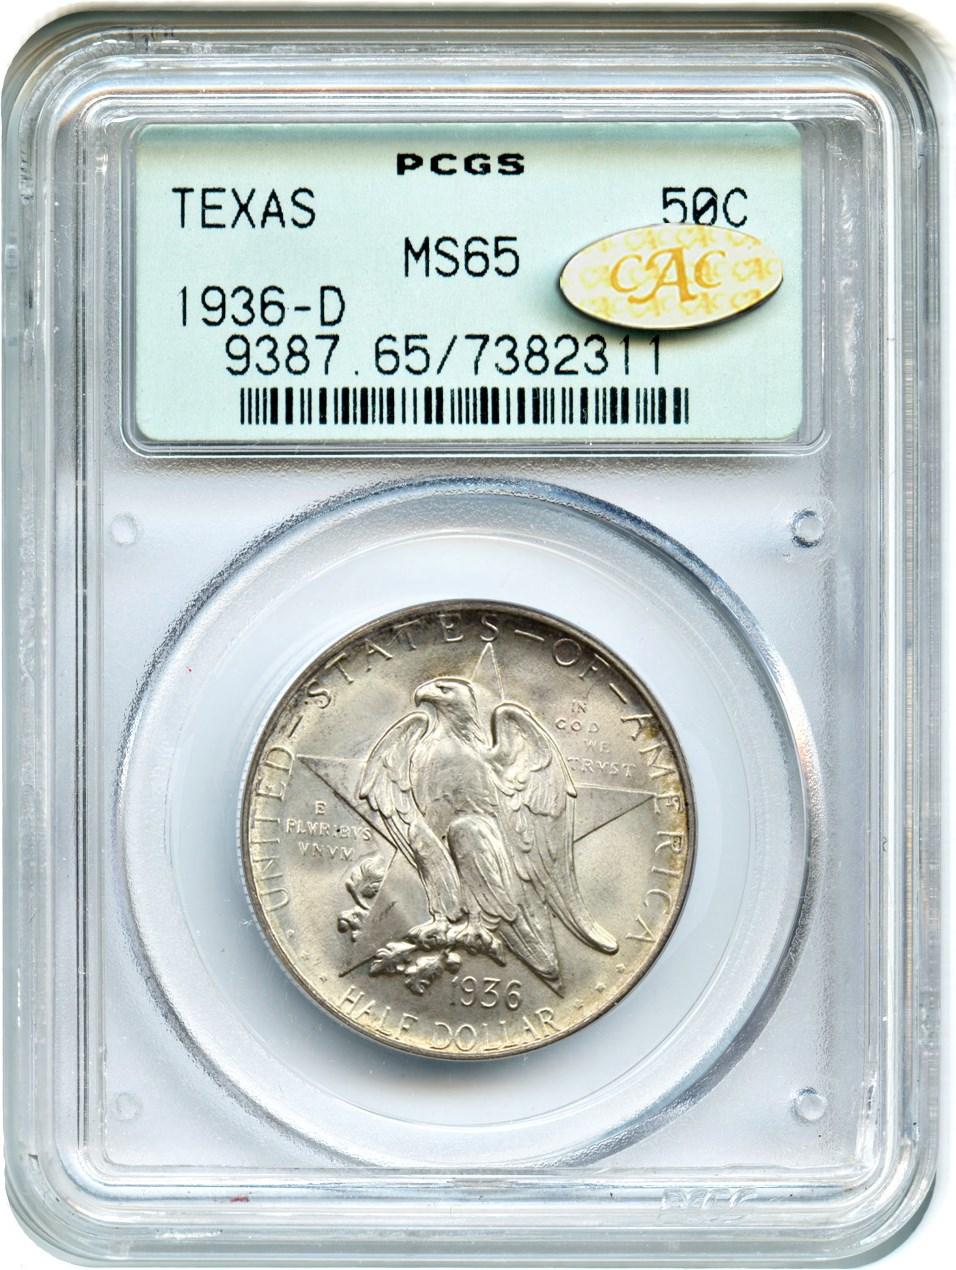 1936-D 7382311 Obverse MS65 CAC(Gold).jpg